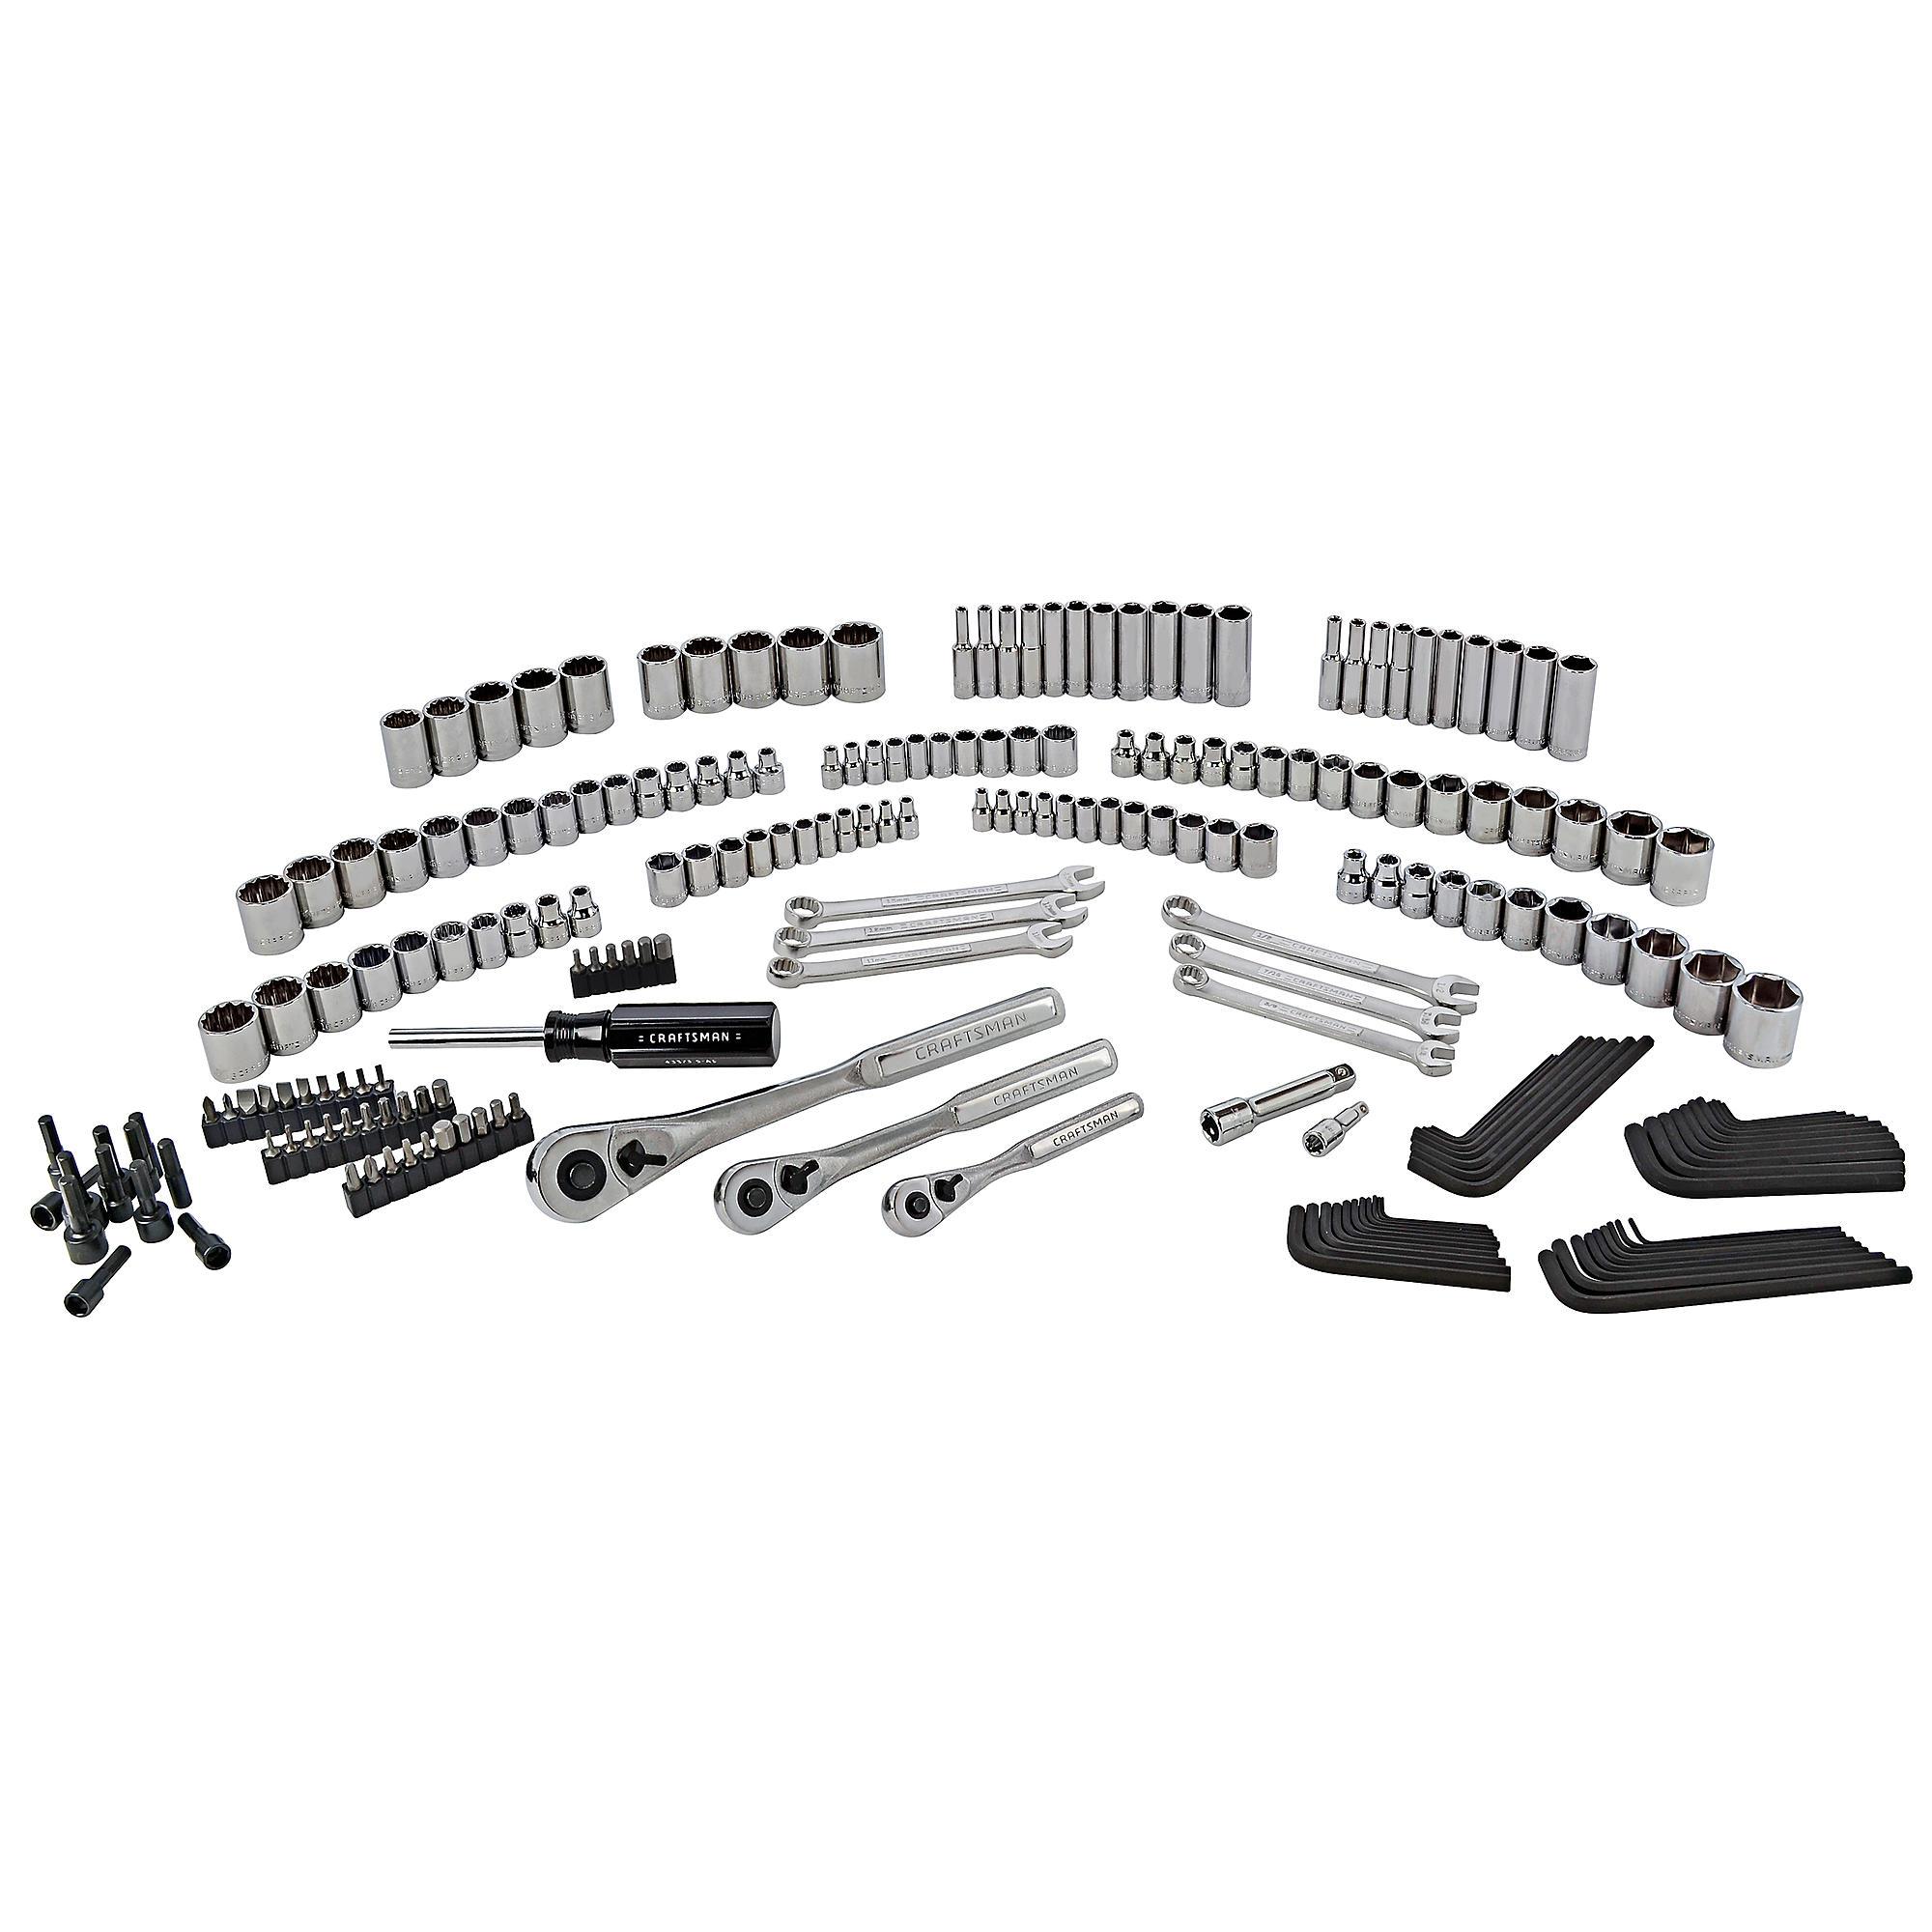 Sears Craftsman 216 Piece Mechanics Tool Set $80.99, $30.25 back in SYW rewards & free shipping